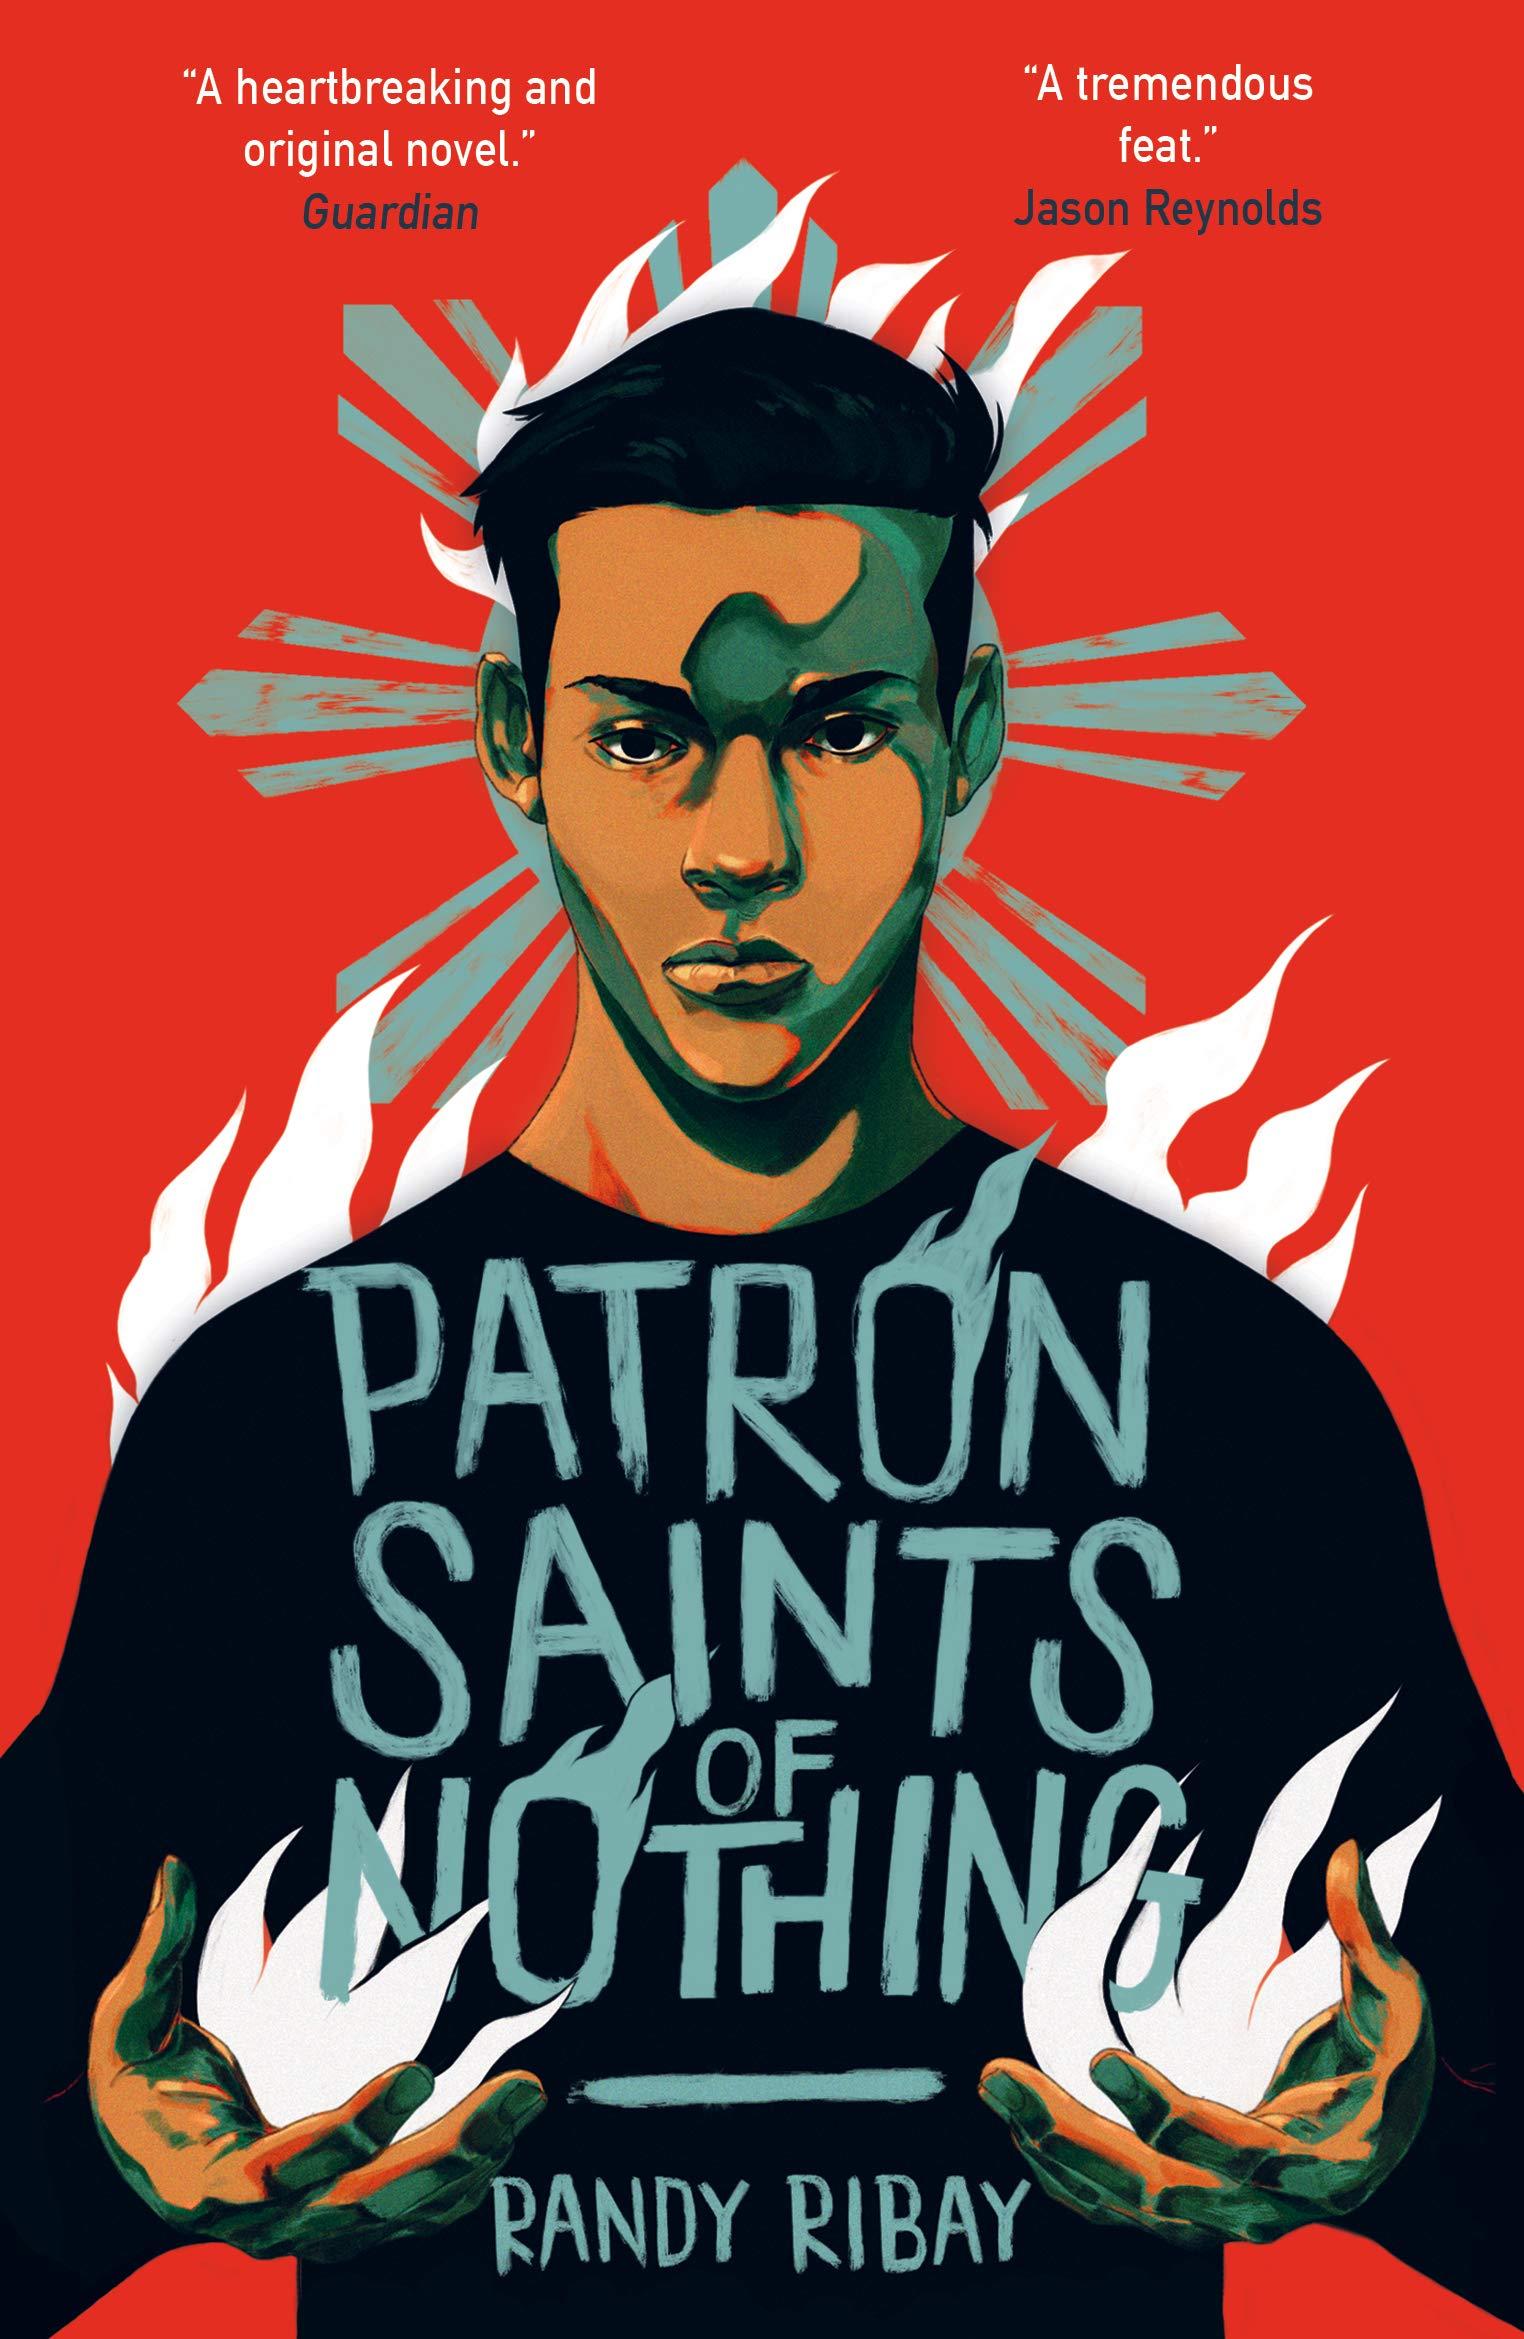 Patron Saints Of Nothing: Amazon.es: Vv.Aa, Vv.Aa: Libros en ...